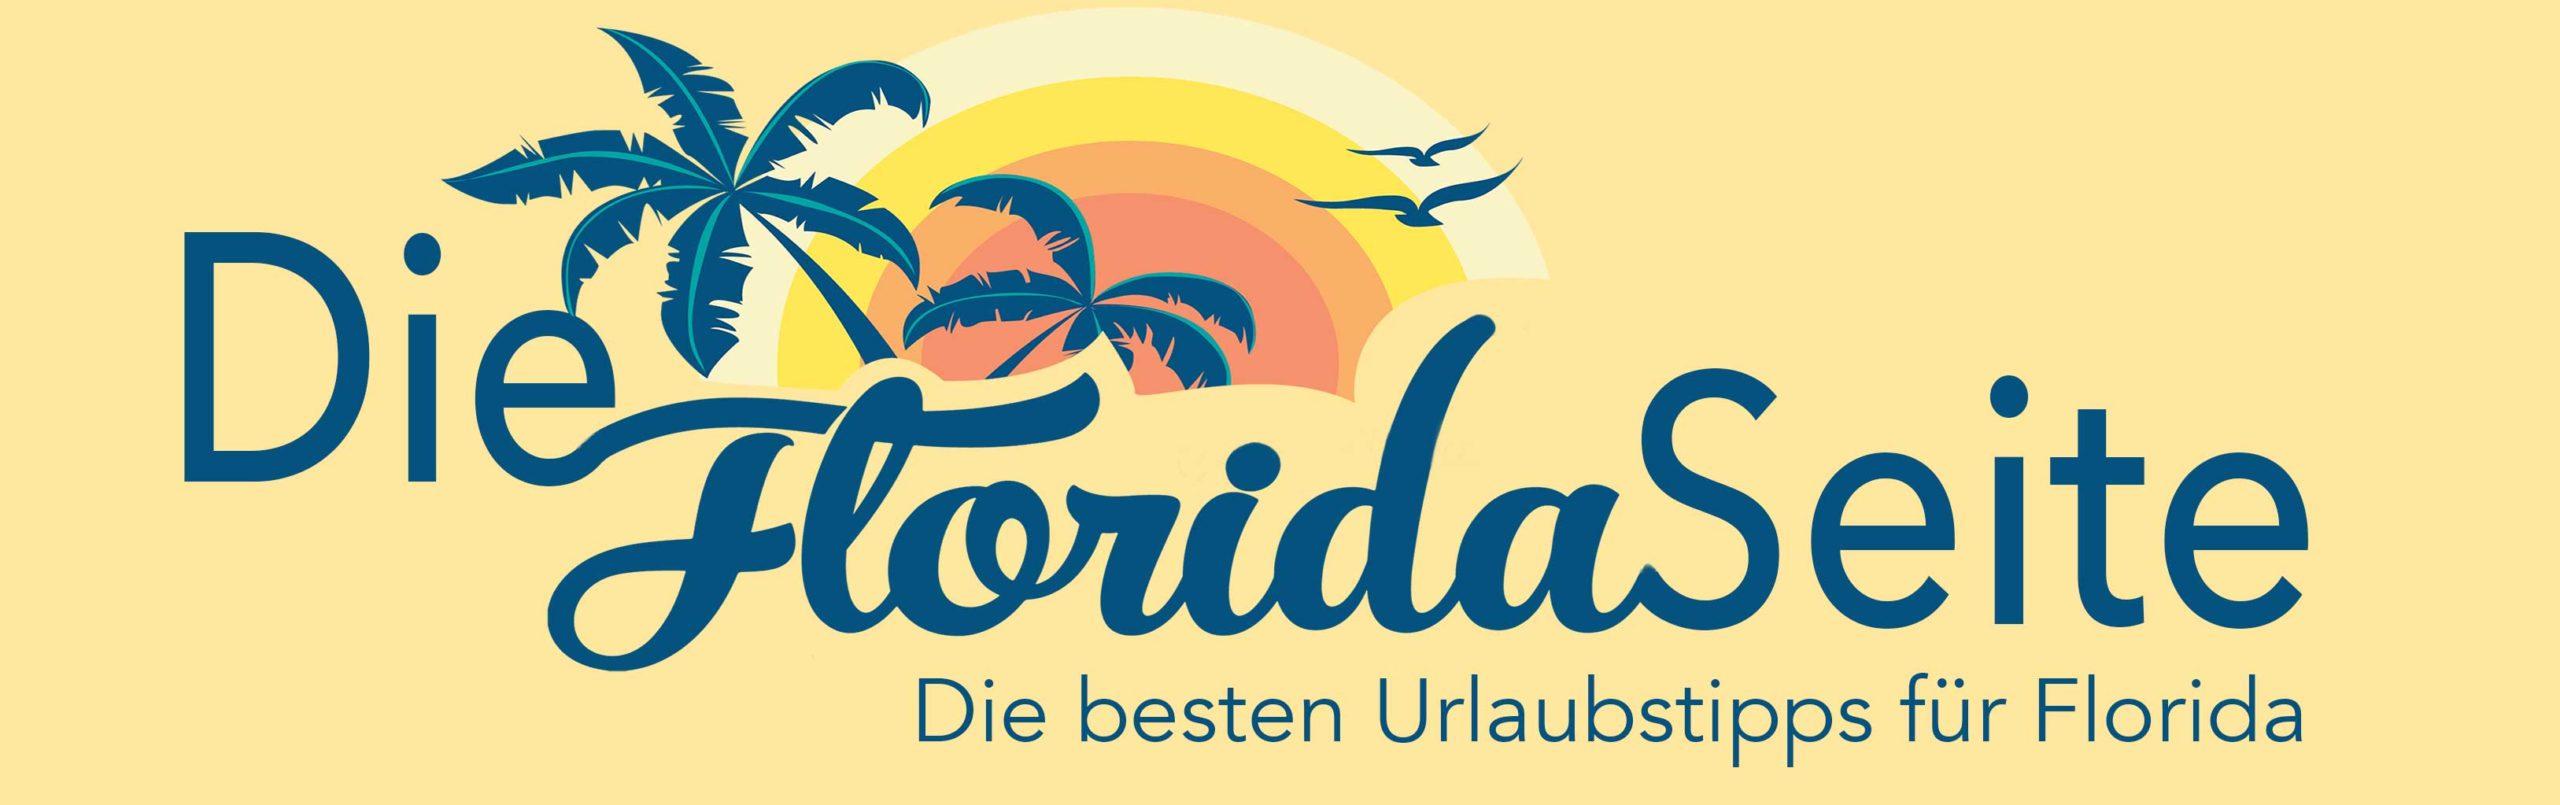 Urlaubstipps Florida